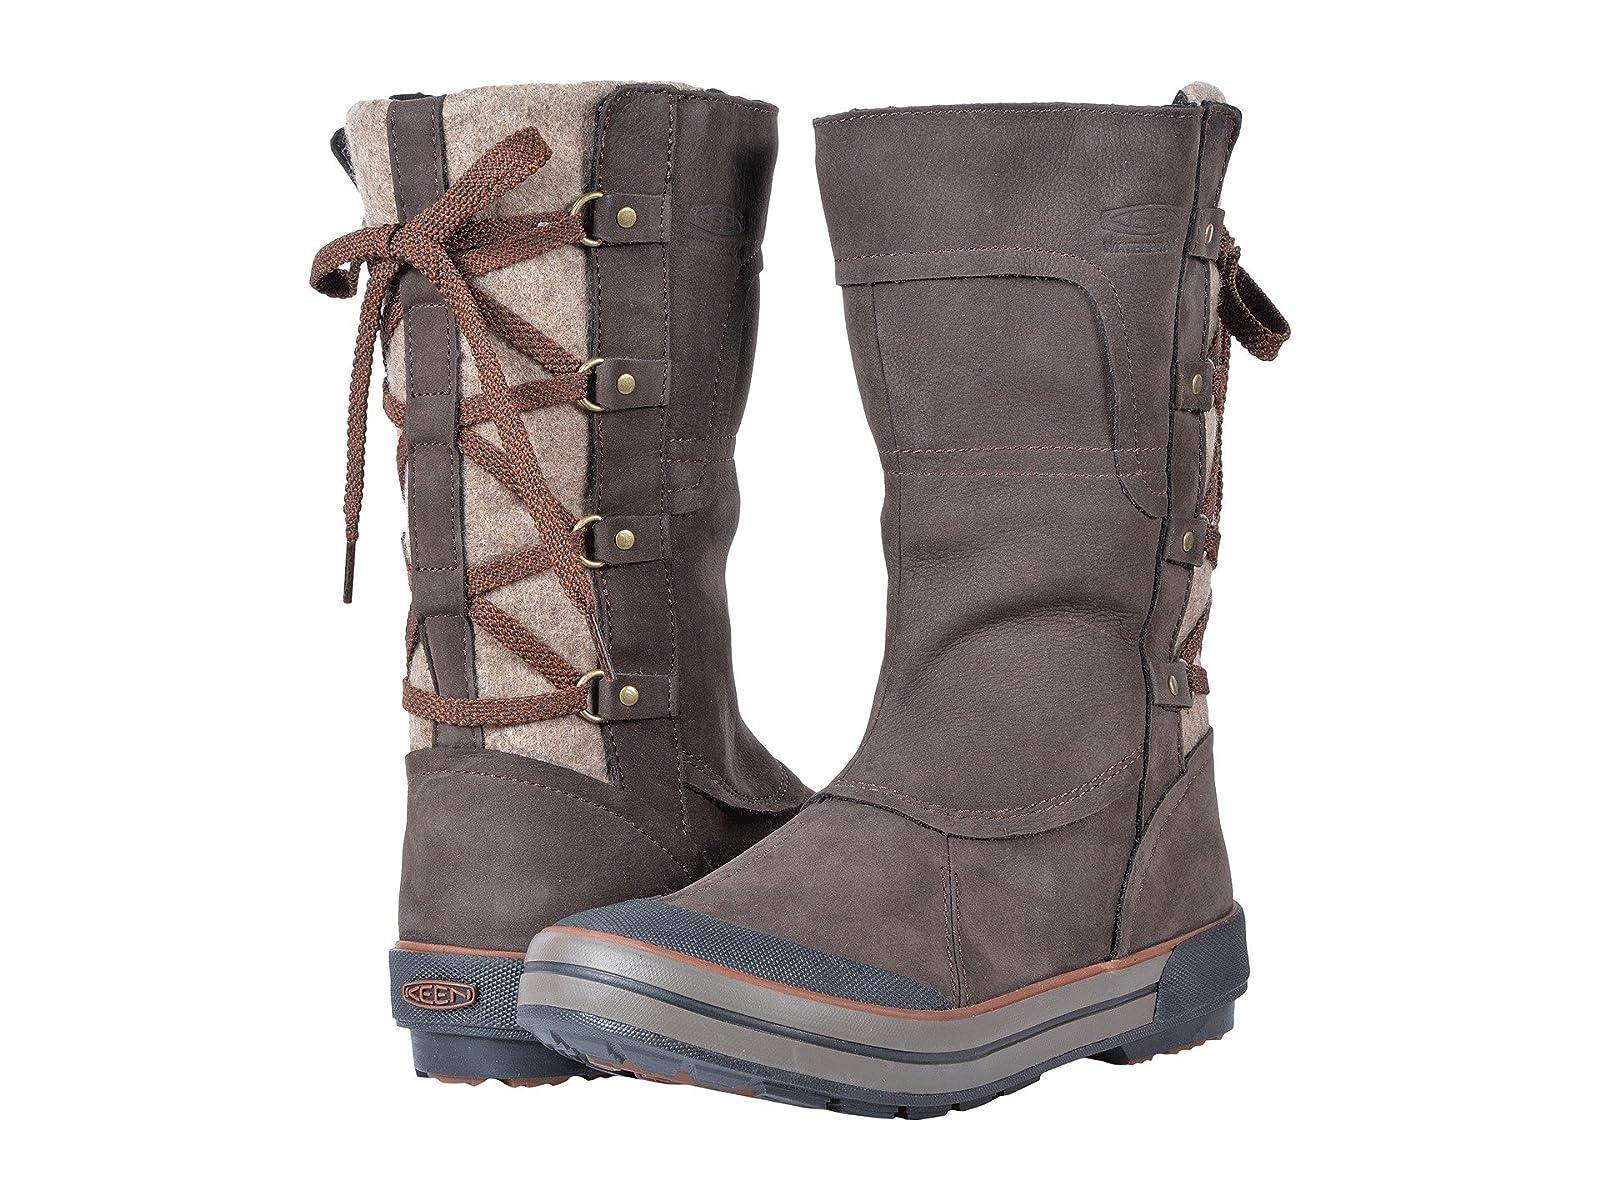 Keen Elsa Premium Zip WaterproofCheap and distinctive eye-catching shoes